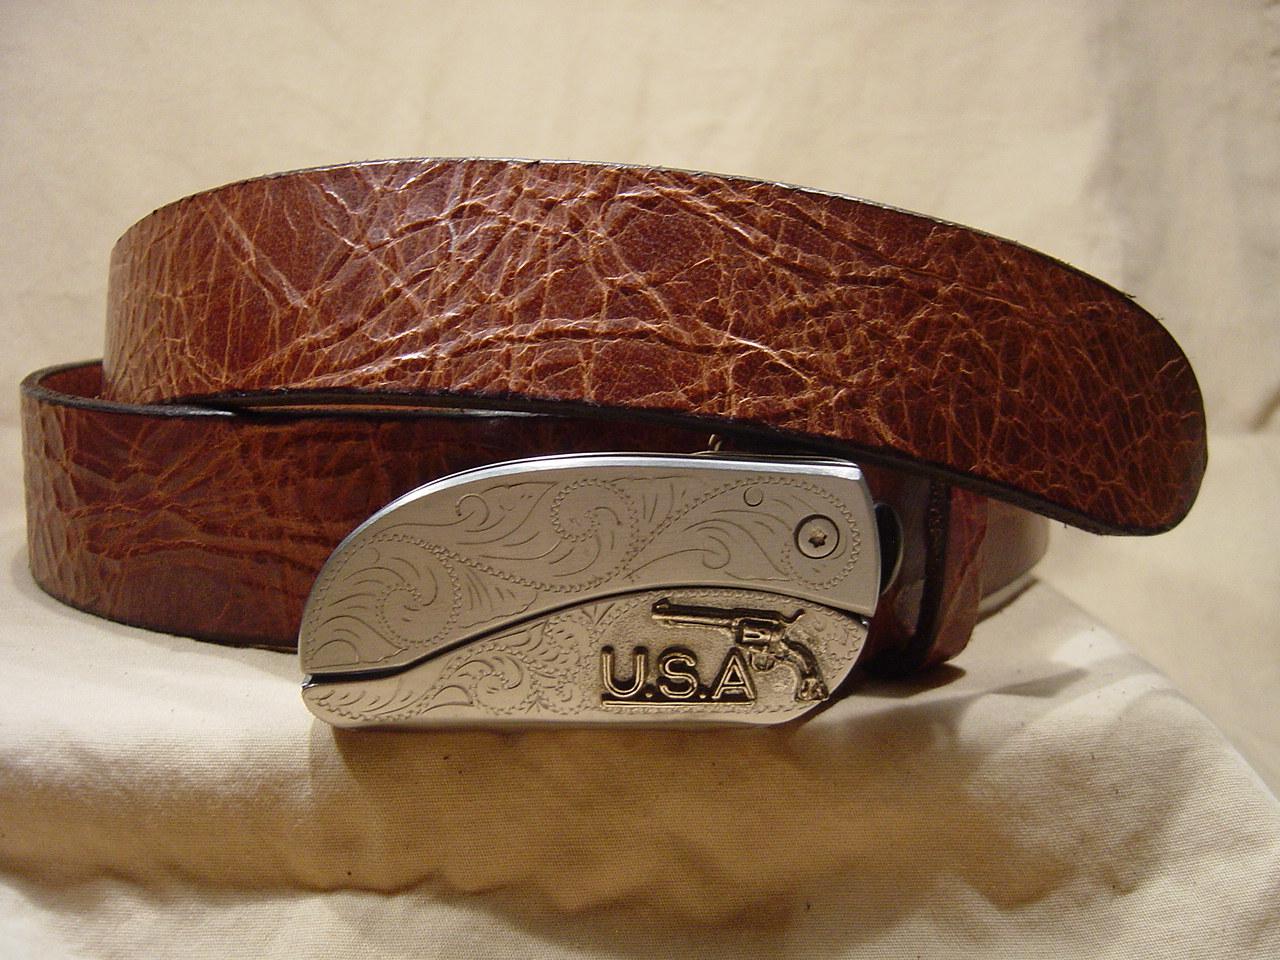 Antique tan leather belt with belt buckle knife